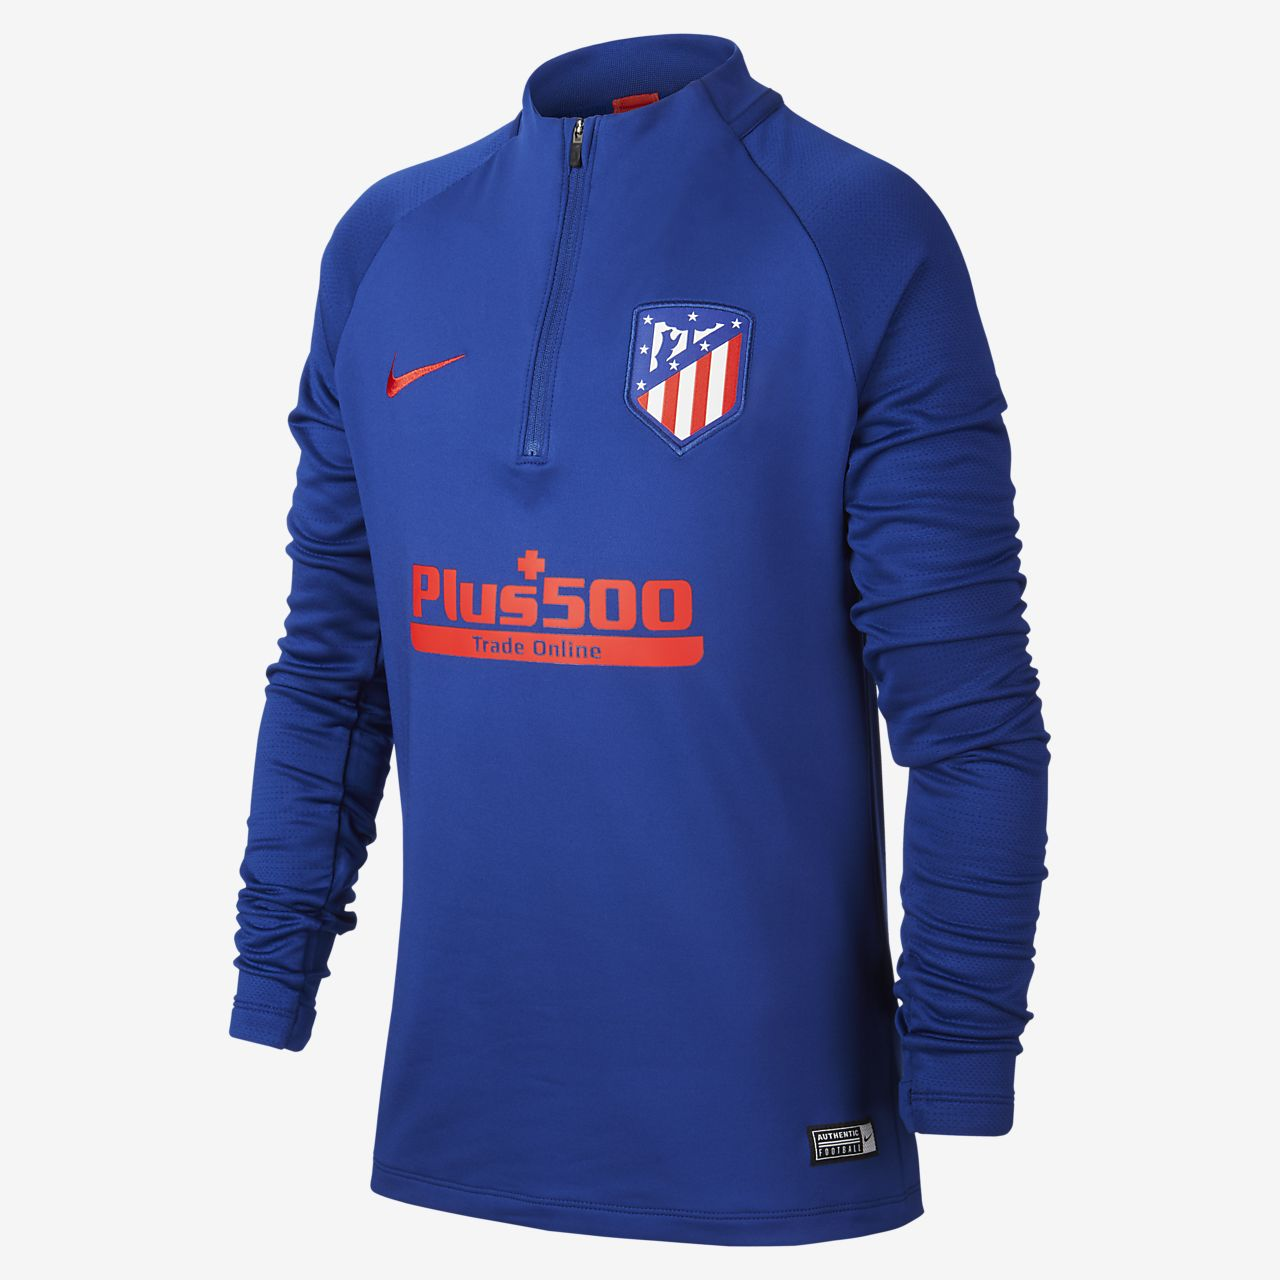 Nike USA, Nike Stockists Authentic USA Online | Largest